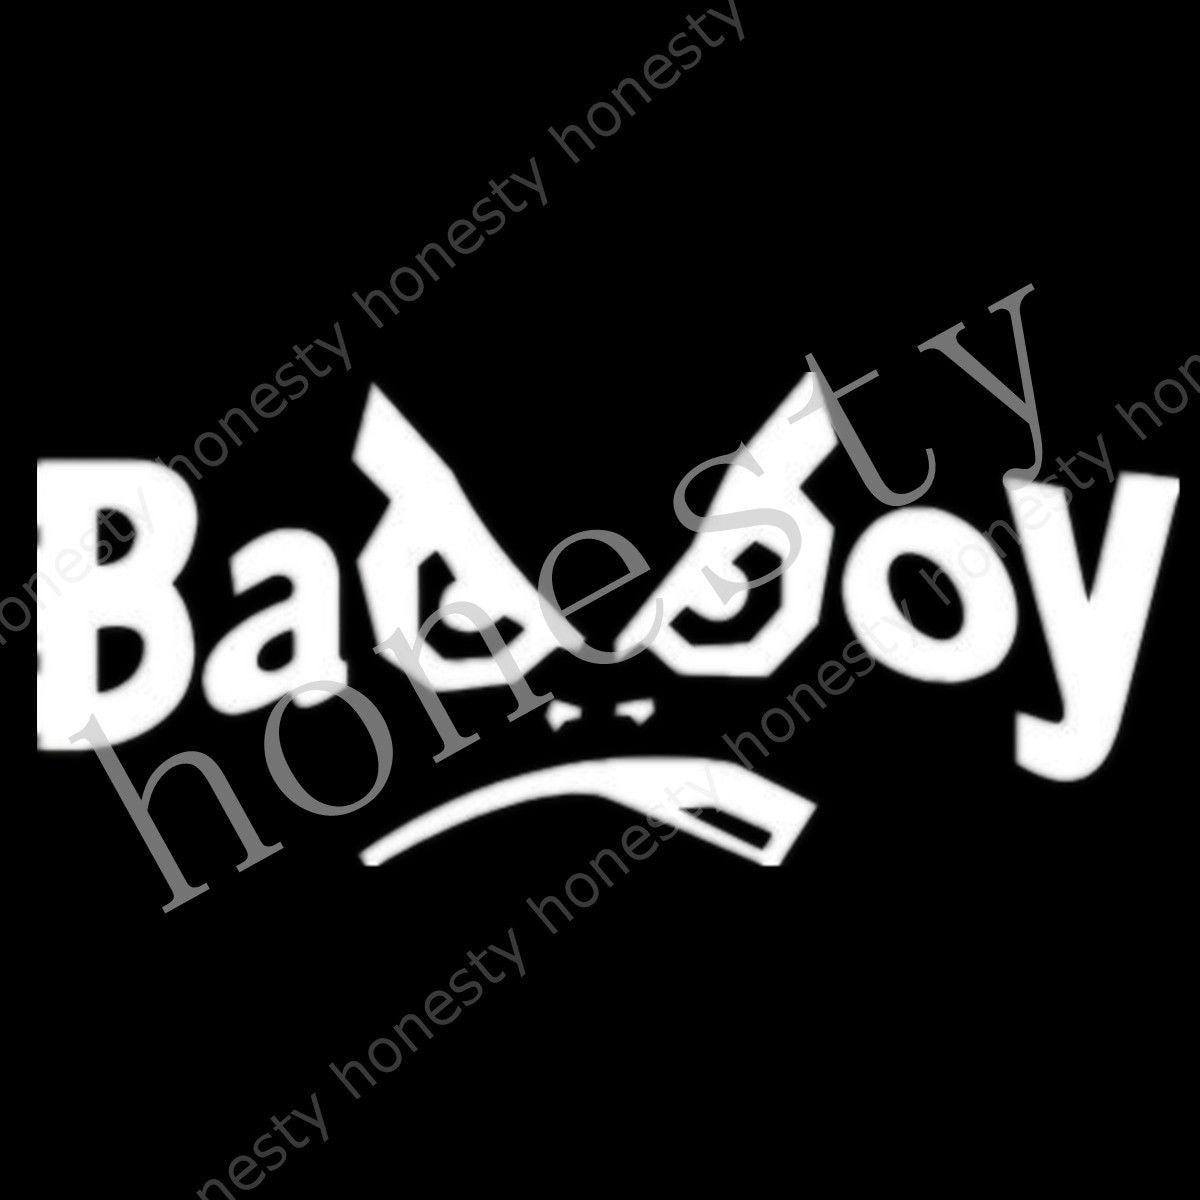 Bike sticker design images - Badboy Bad Boy Logo Sticker Evo Jdm Drift Vinyl Funny Dope Window Laptop Bike China